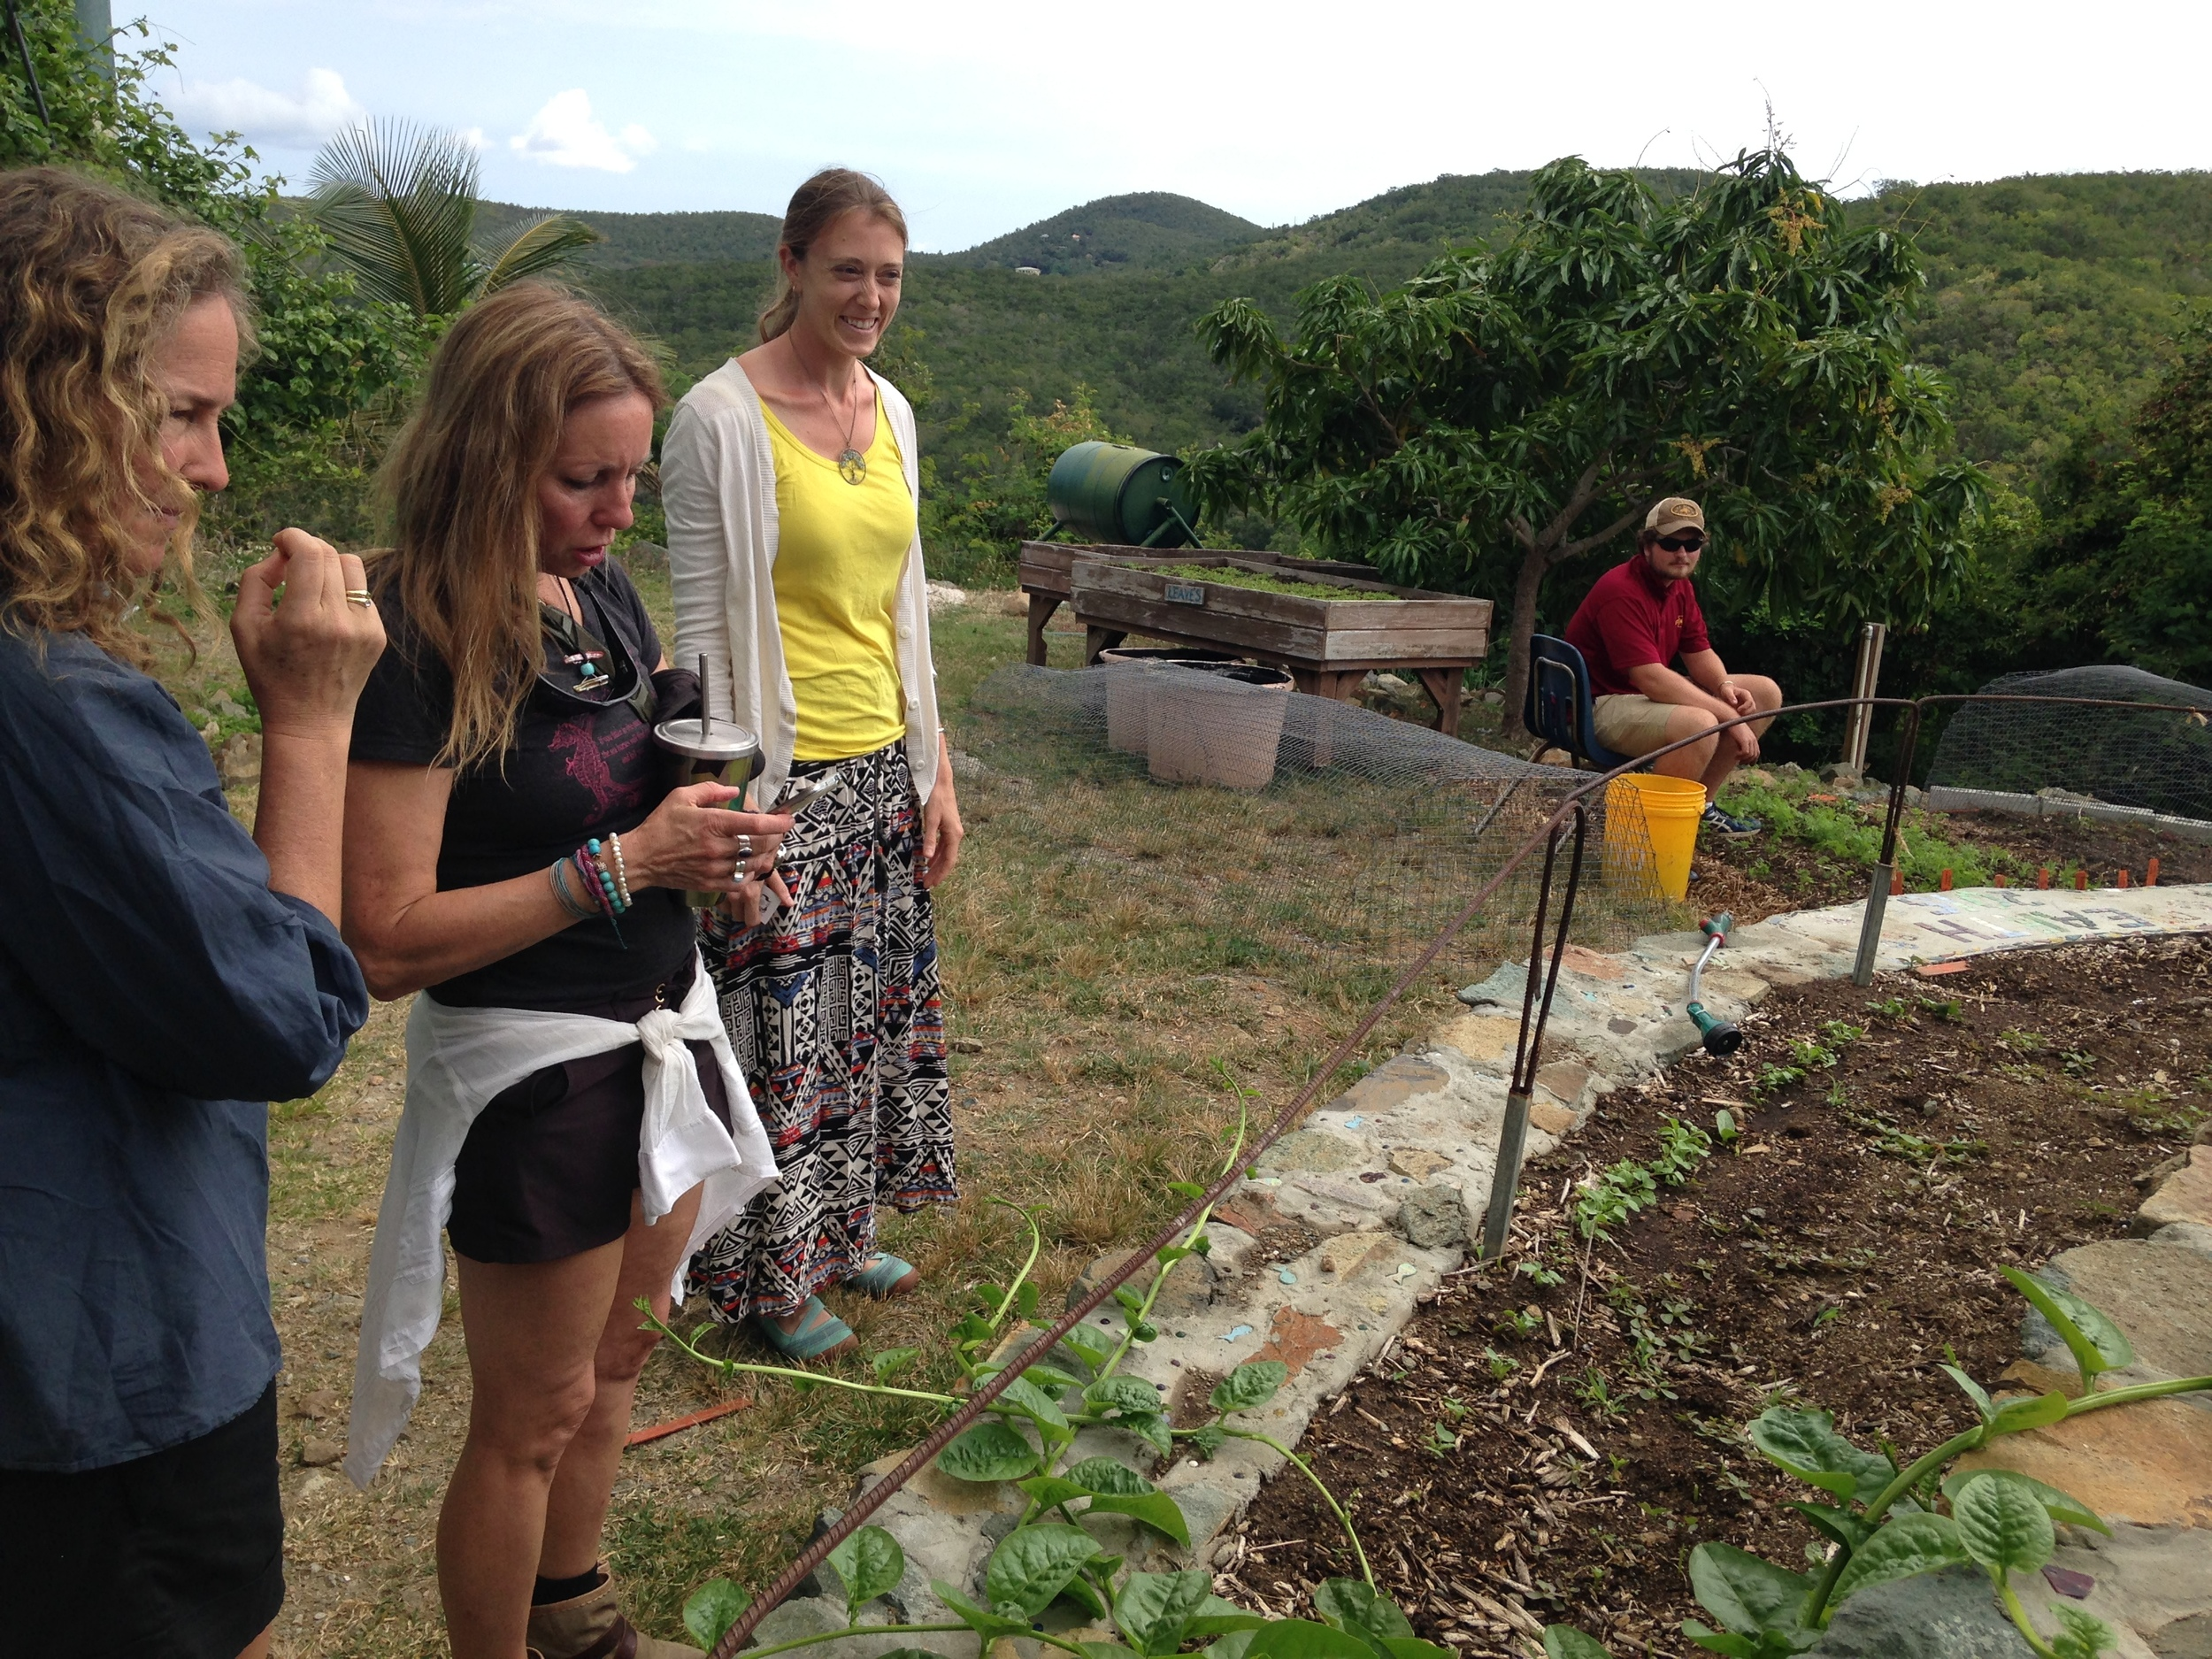 Dianna Cohen, Pam Longobardi & Mary Vargo at Gifft Hill School garden, St. John